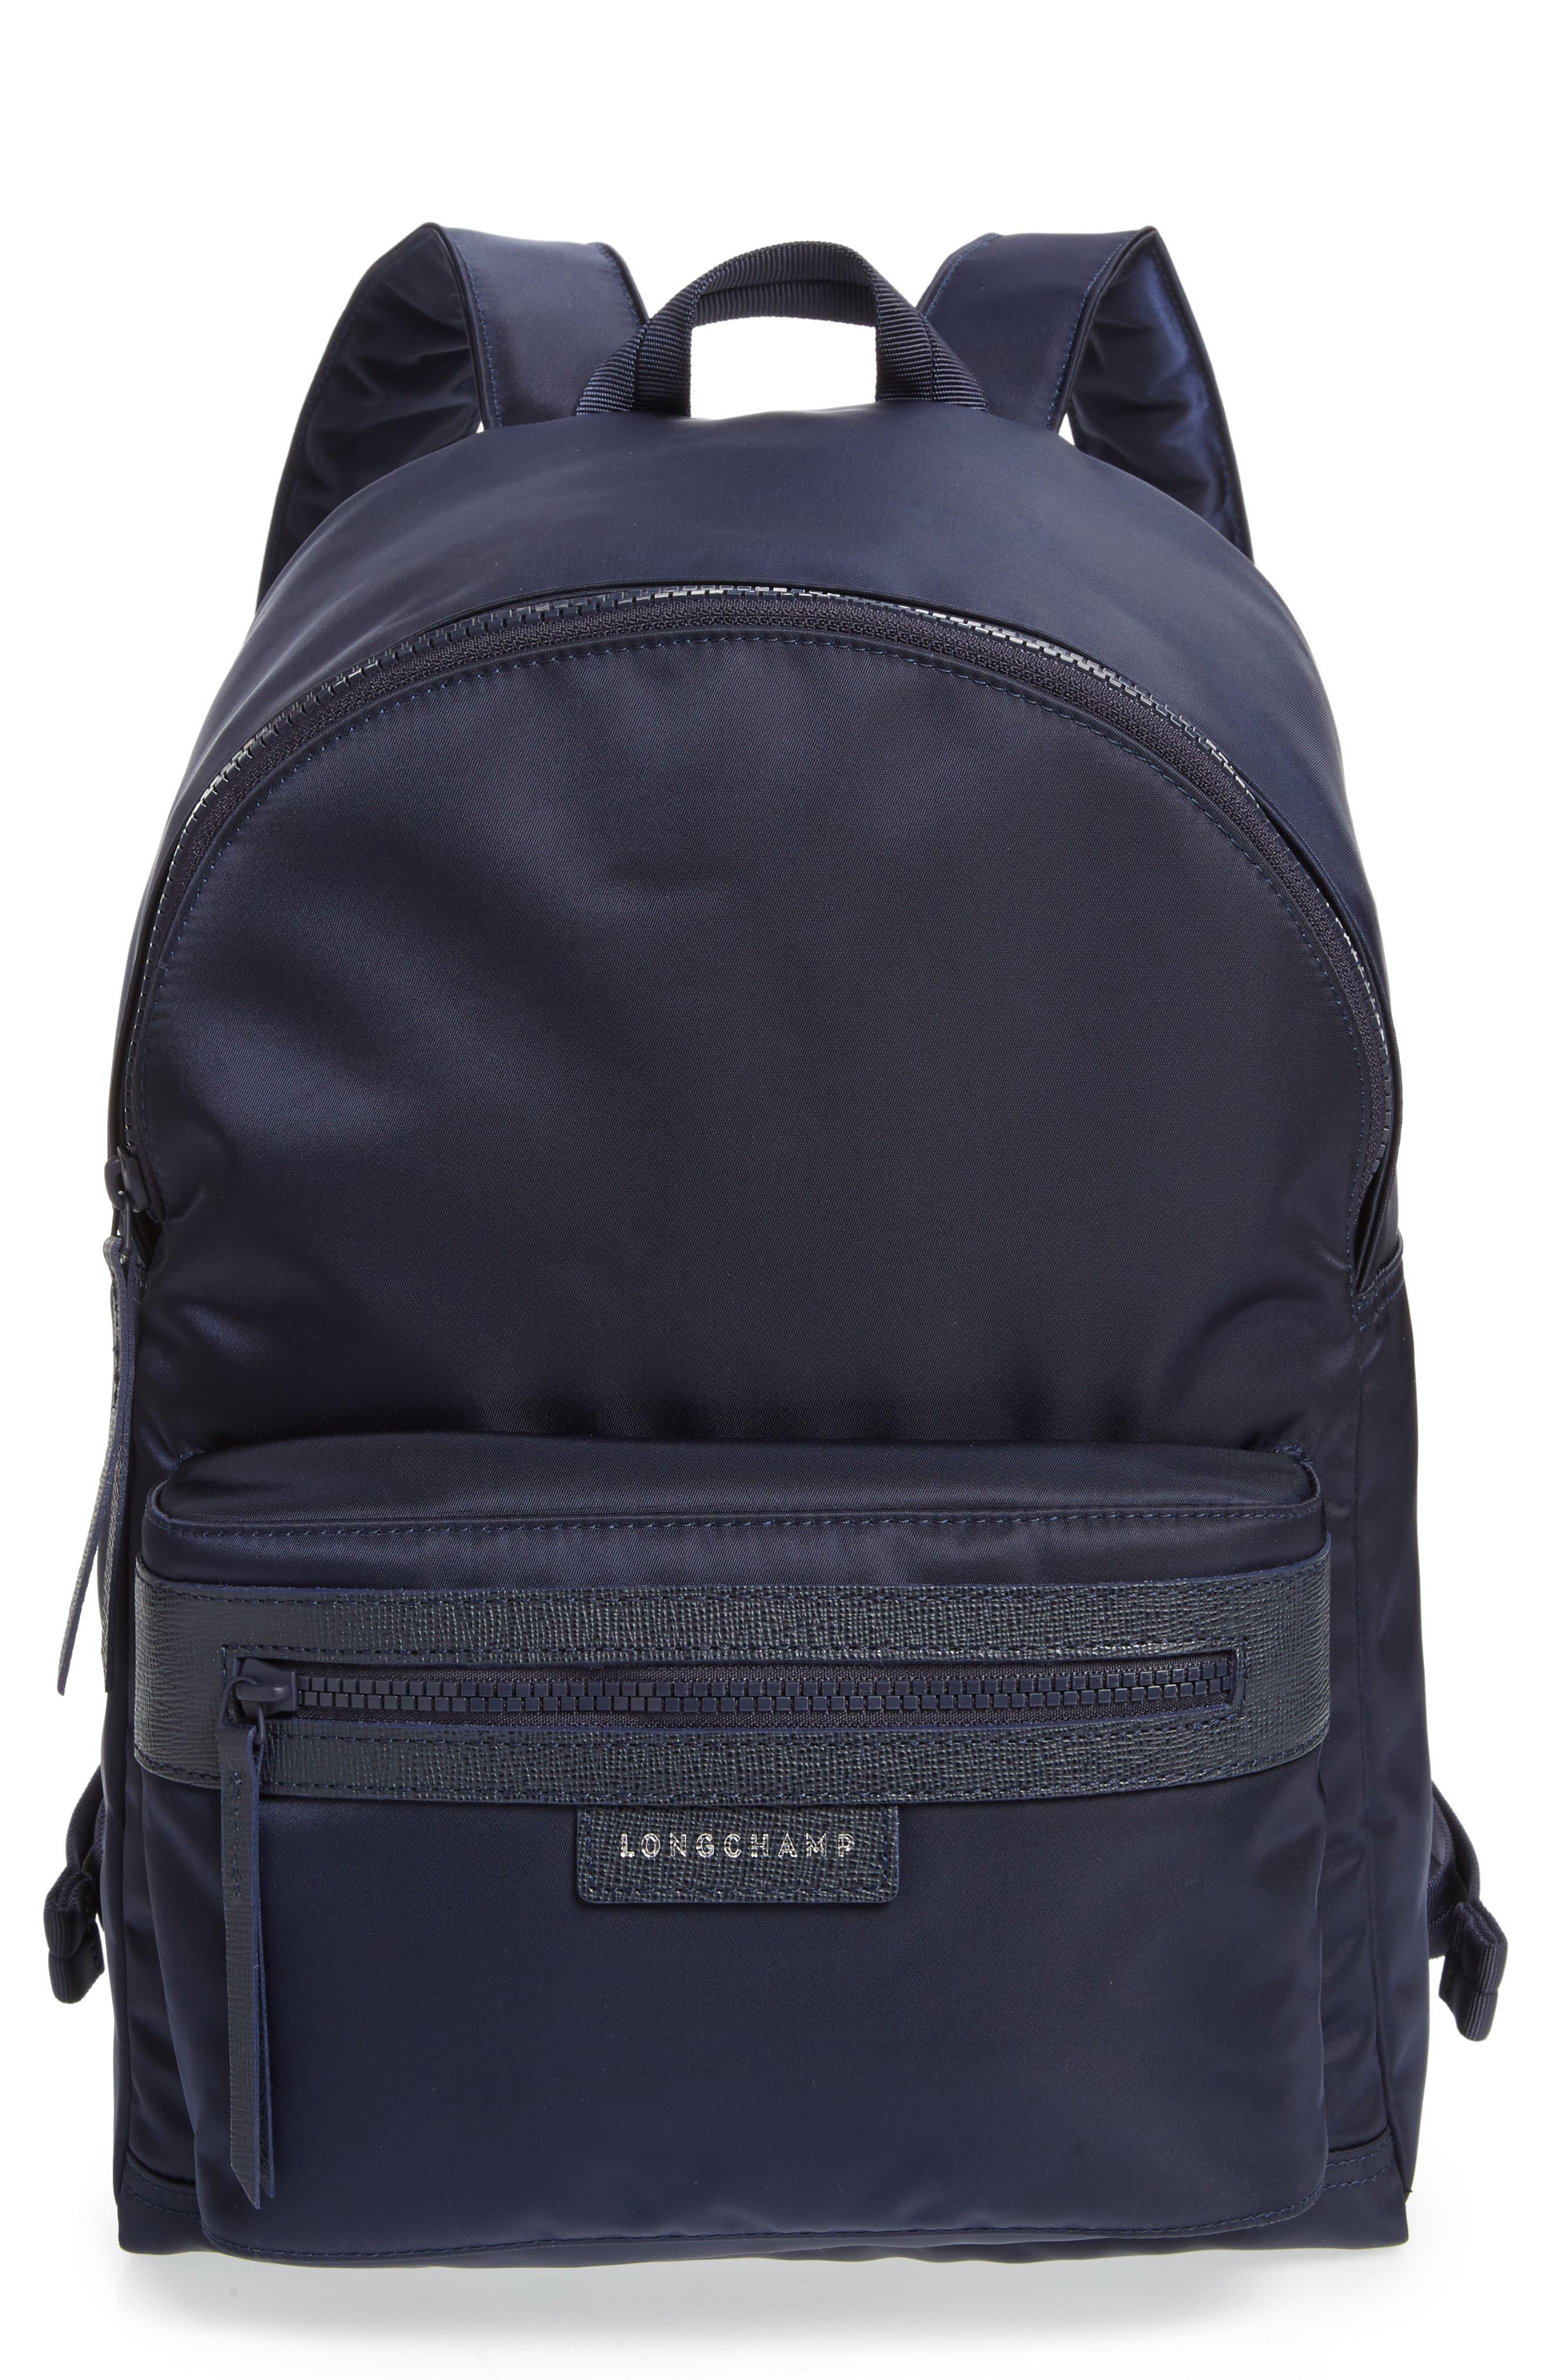 Longchamp \u0027Le Pliage Neo\u0027 Nylon Backpack